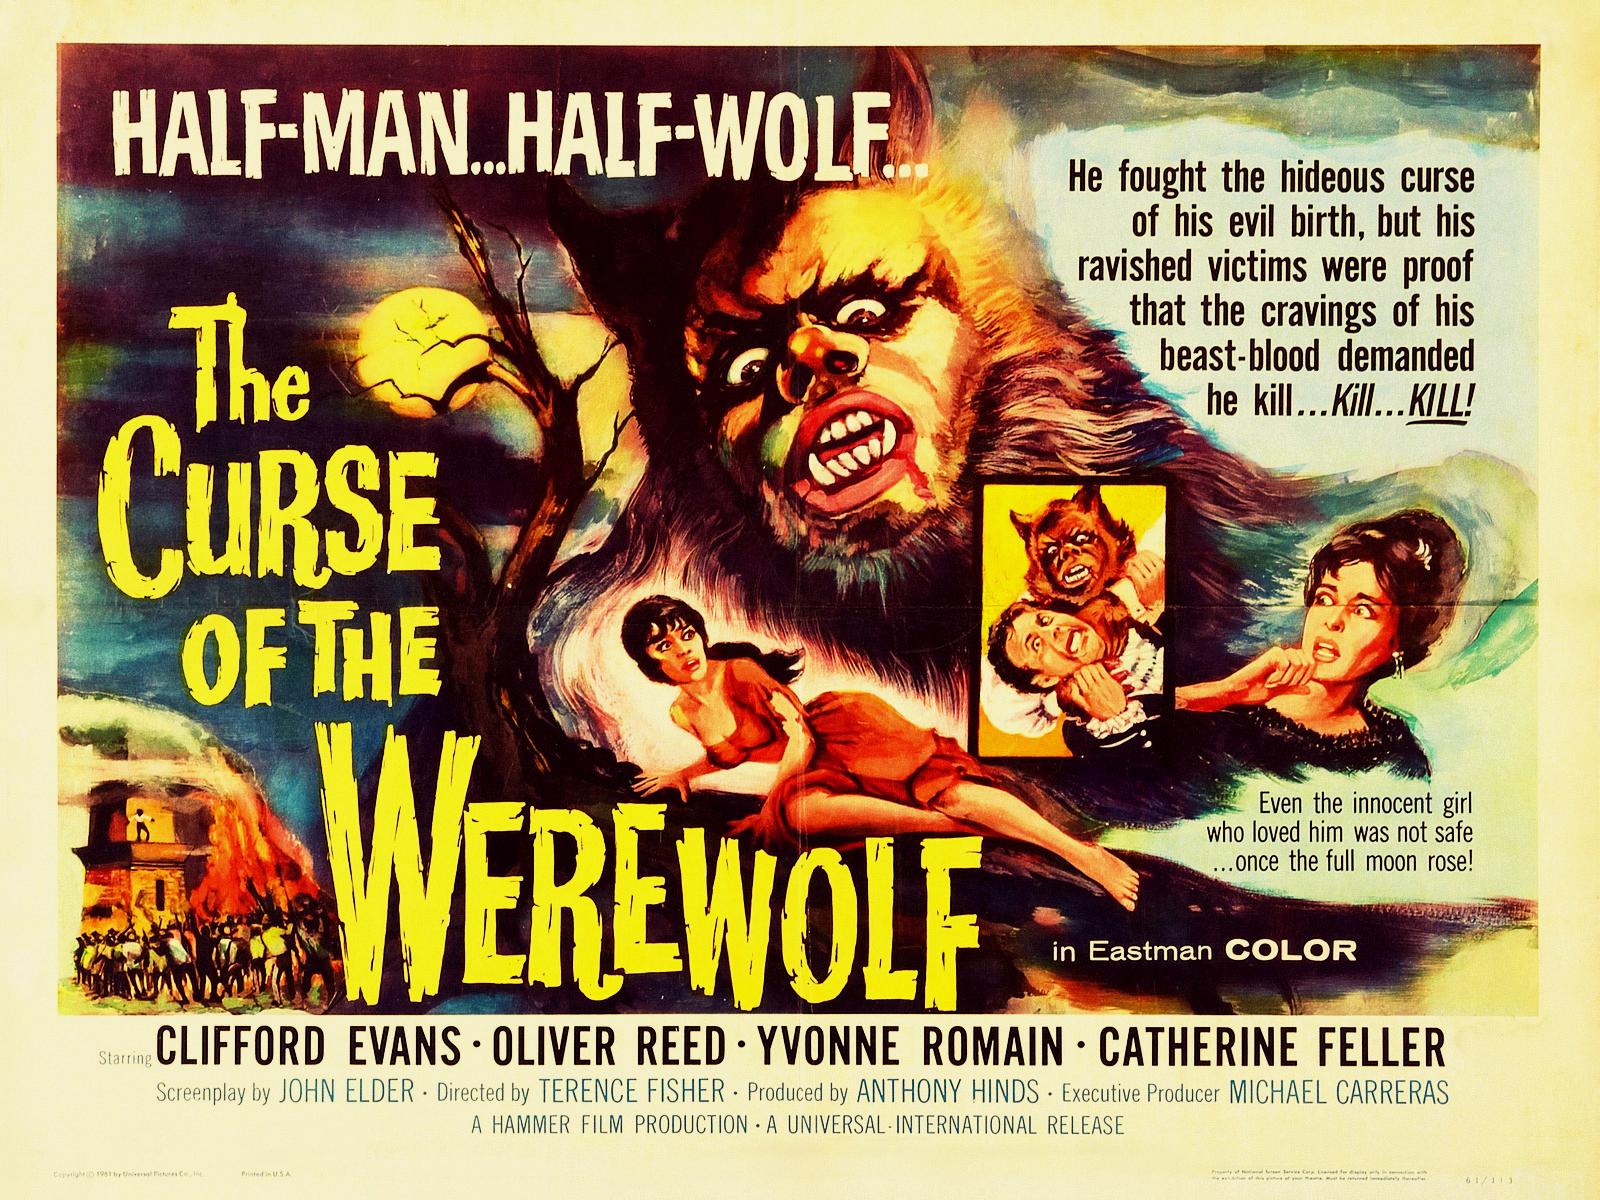 Curse-of-the-Werewolf-poster-hammer-horror-films-39900440-1600-1200